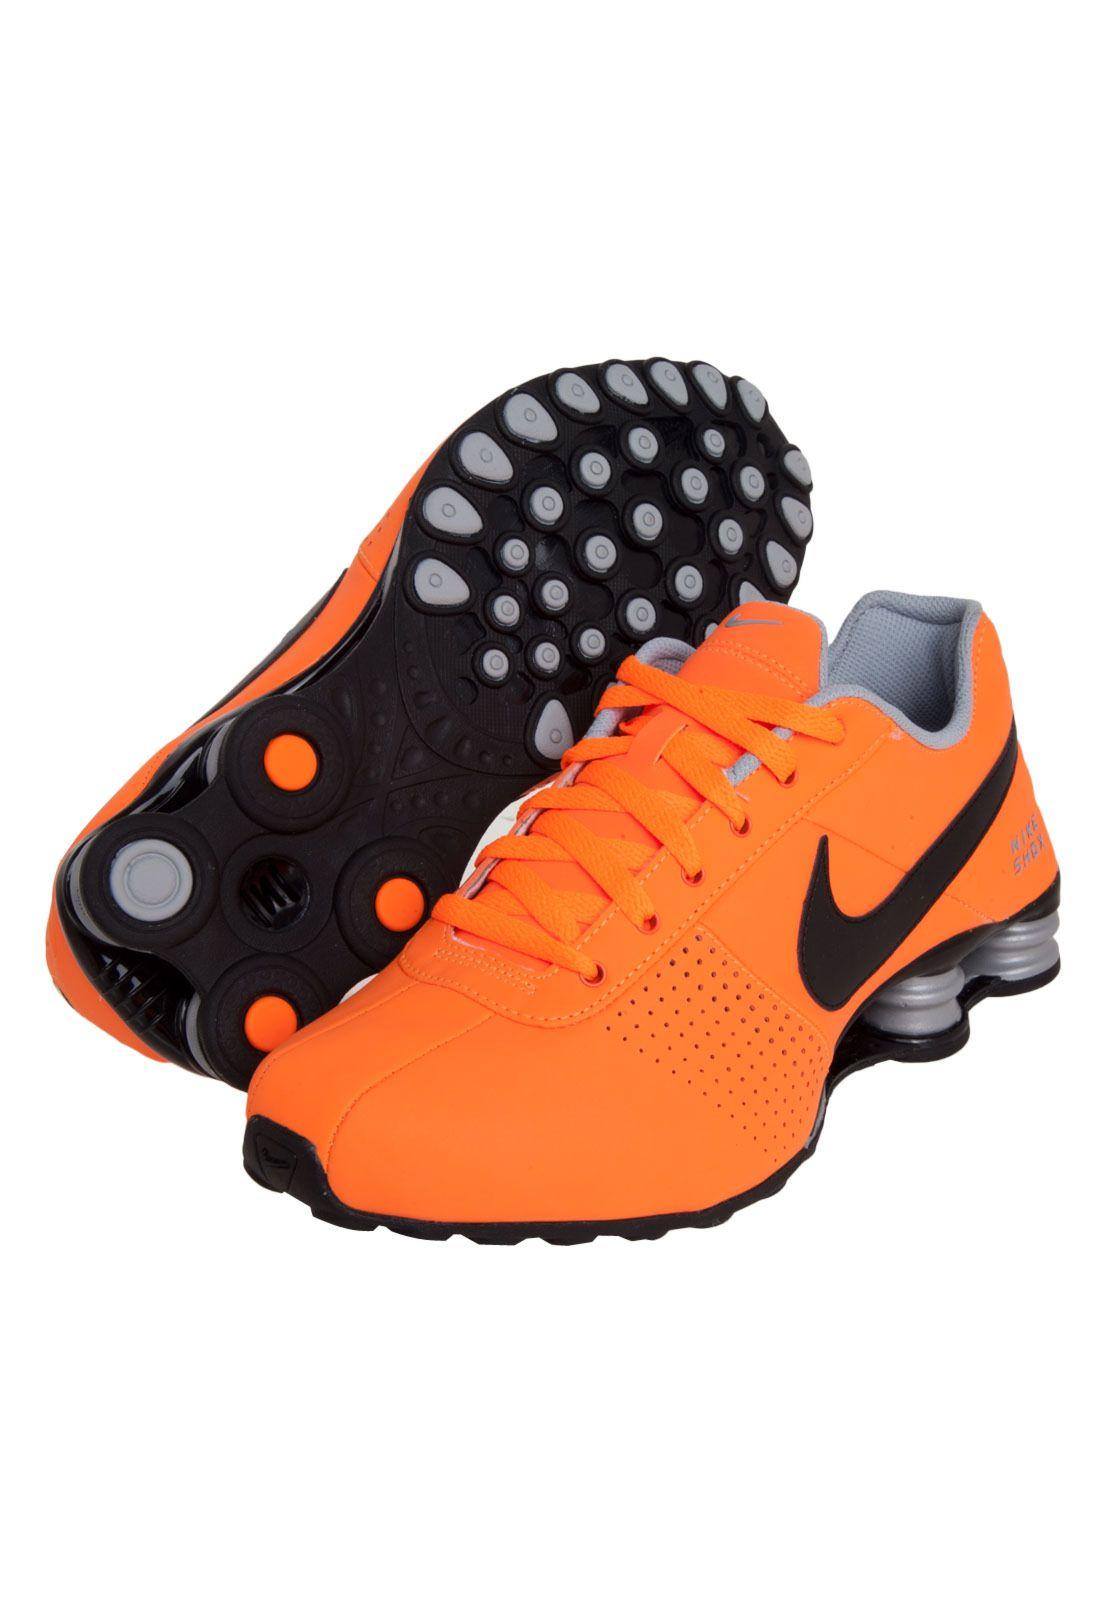 50ff02a2419 Nike-Tênis-Nike-Shox-Deliver-Laranja-9555-8131461-1-zoom.jpg (1104×1600)